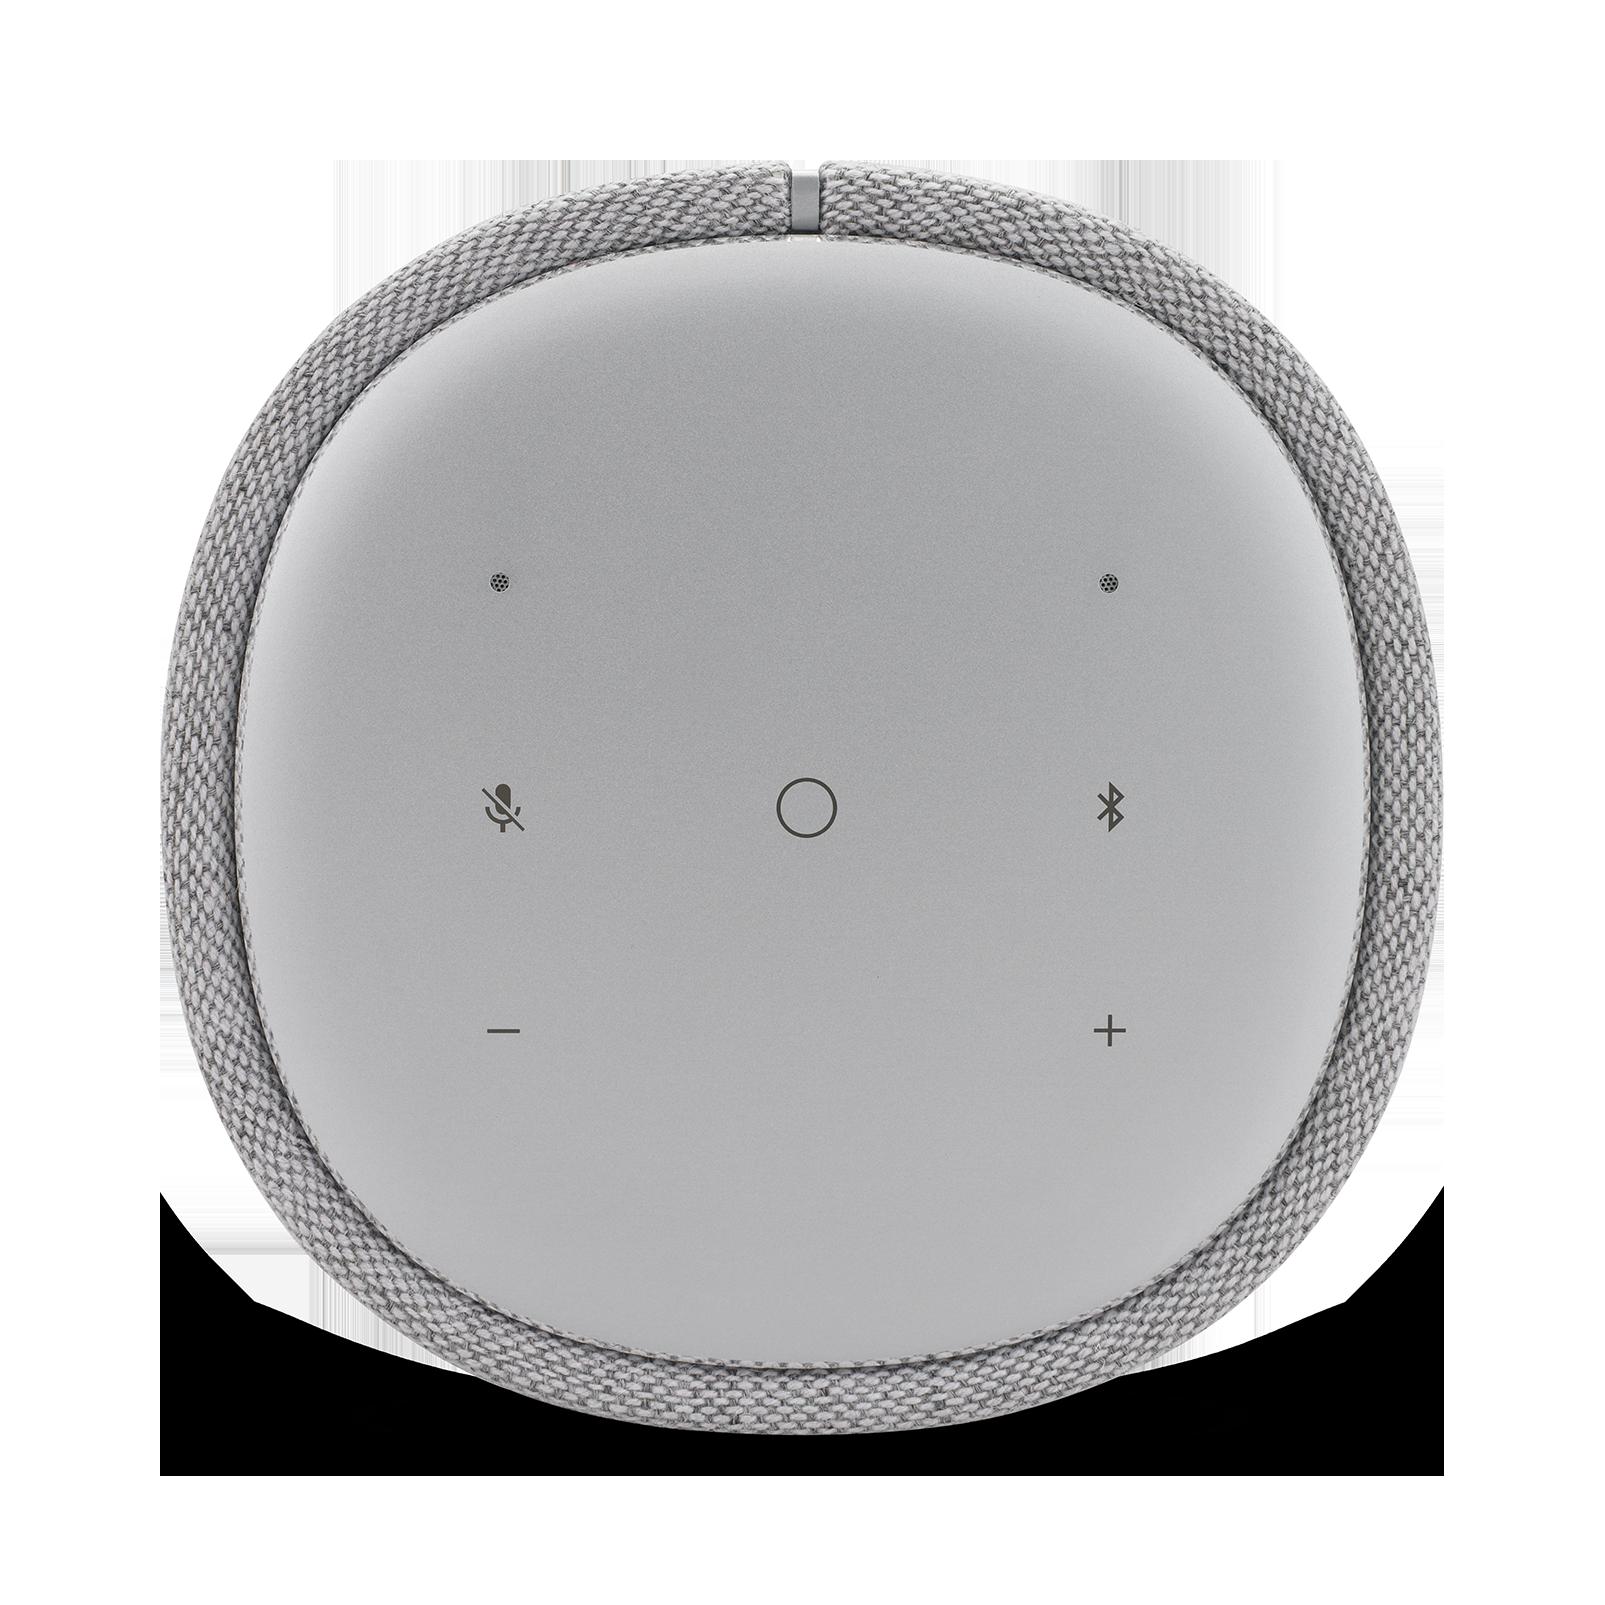 Harman Kardon Citation ONE - Grey - Compact, smart and amazing sound - Detailshot 3